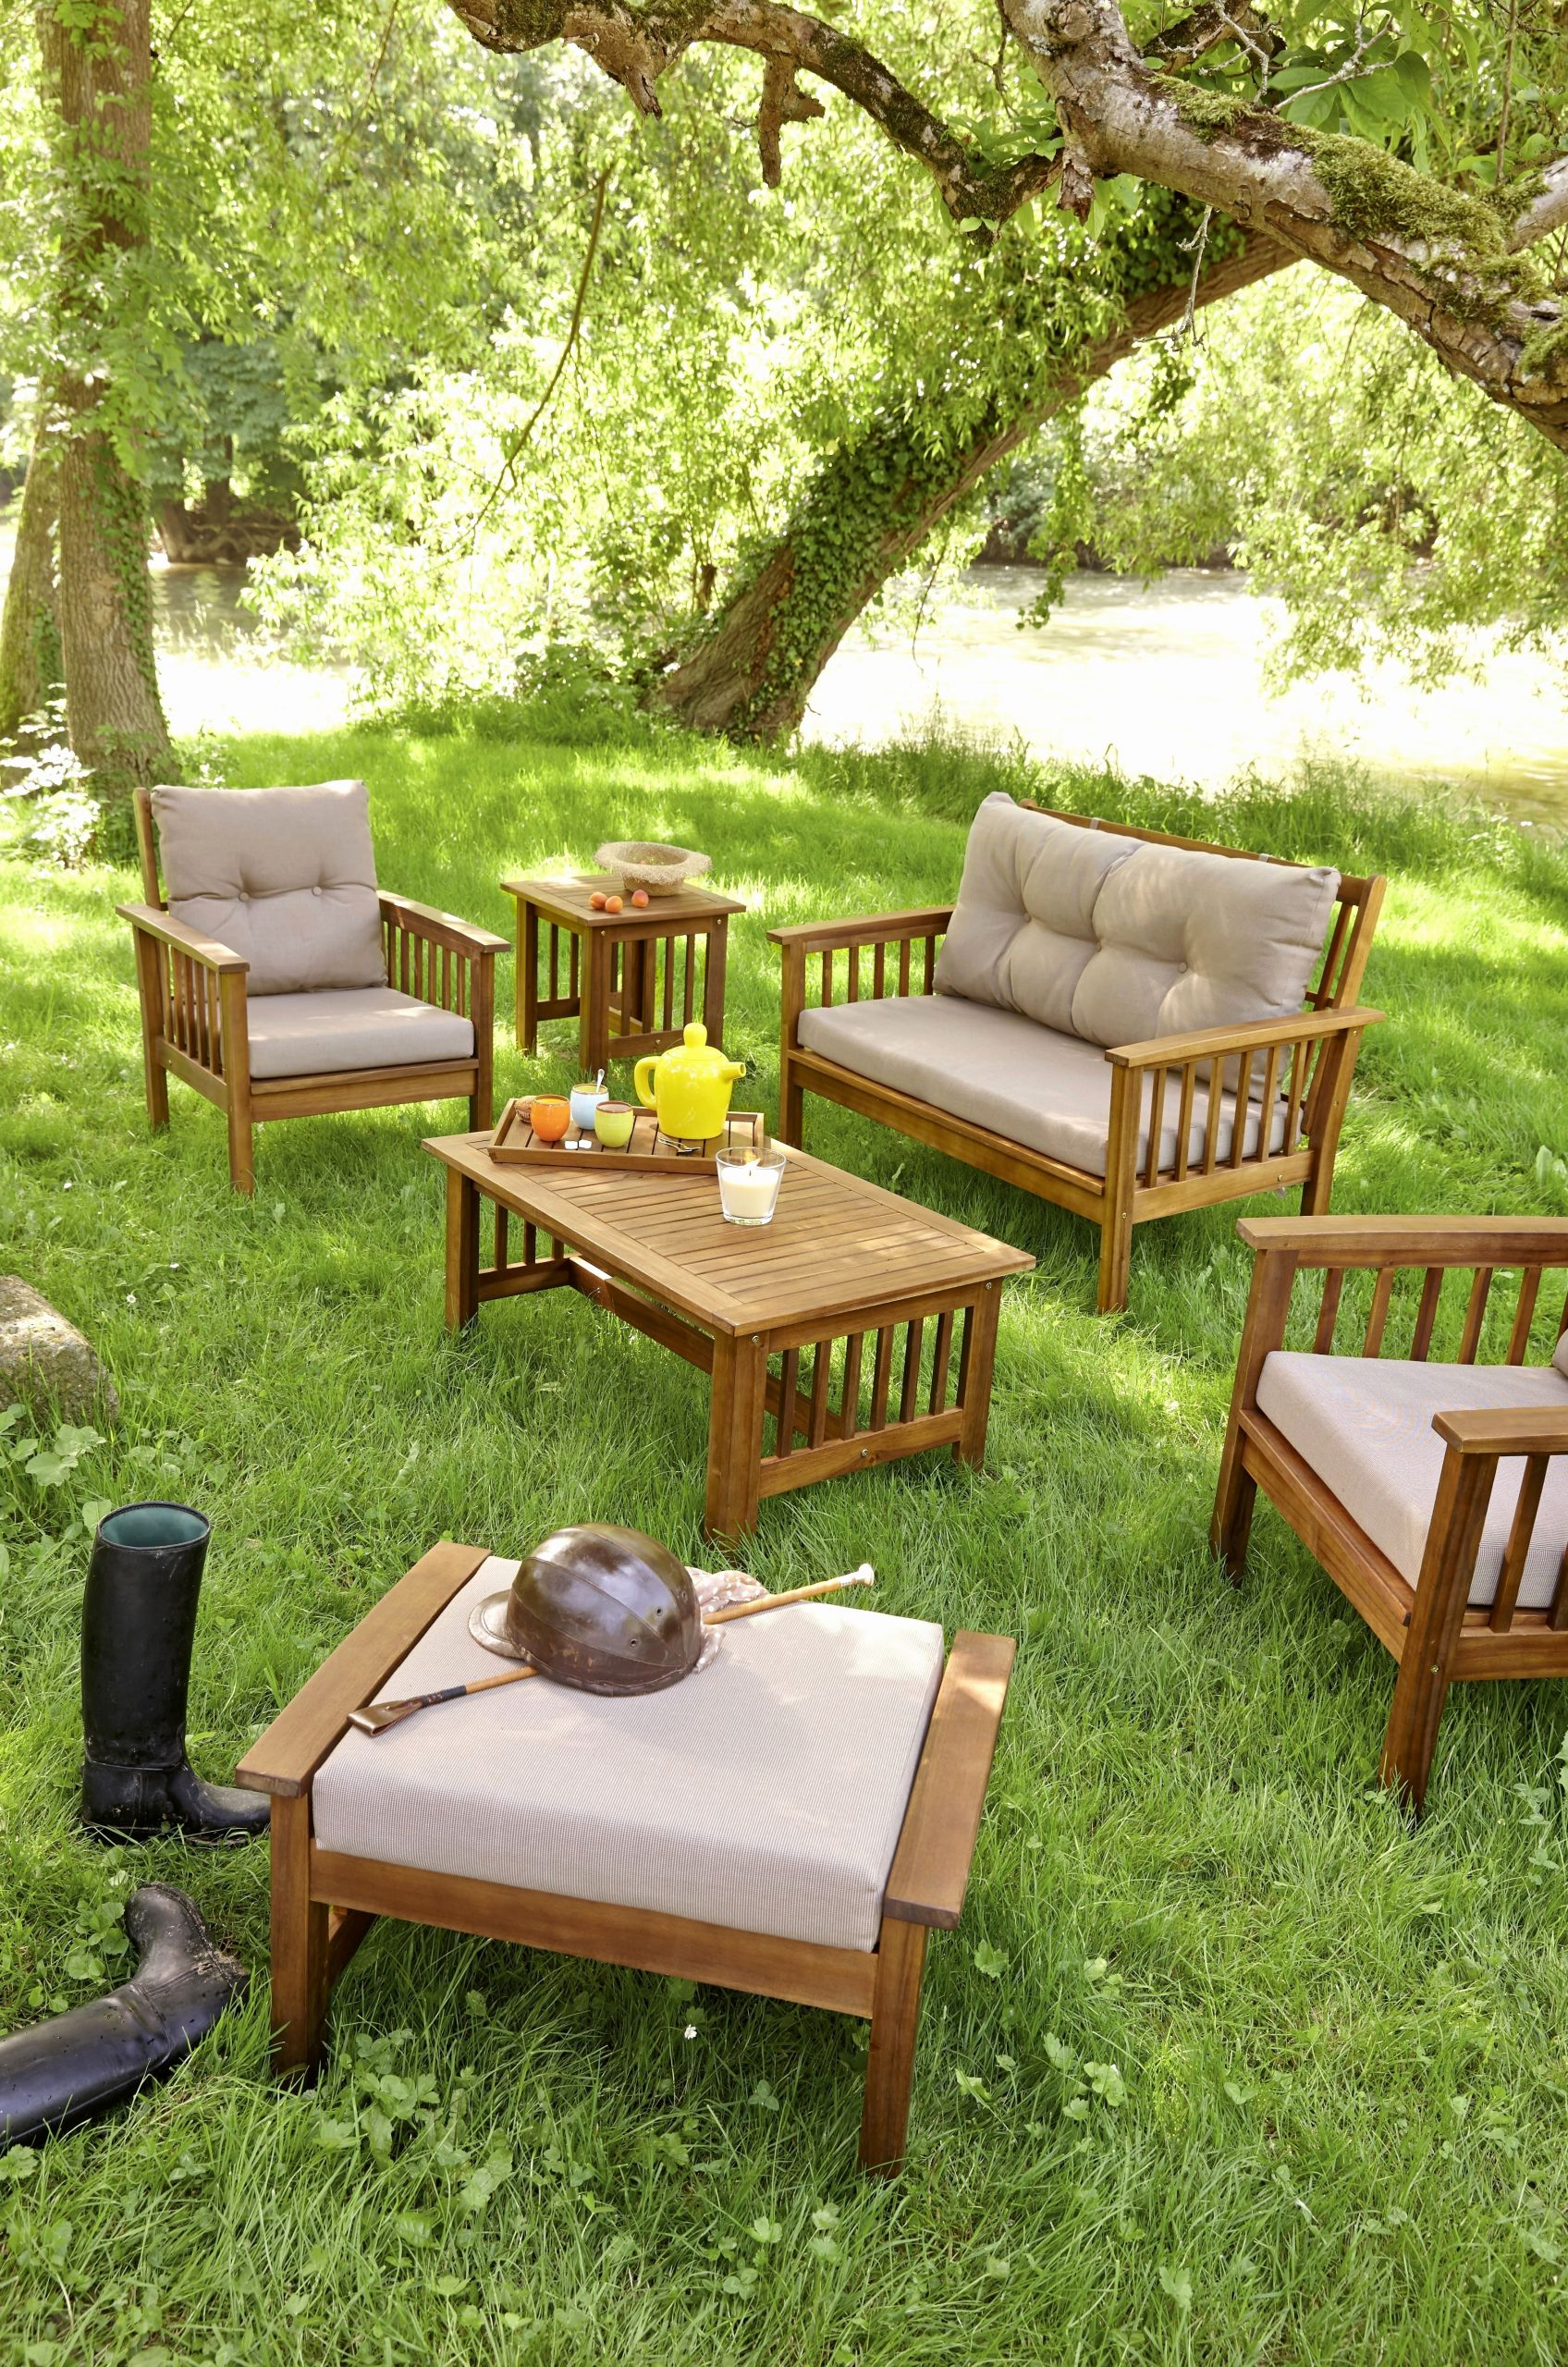 meuble de jardin en bois beau salon de jardin en teck inspirational banc de salon banc jardin bois of meuble de jardin en bois